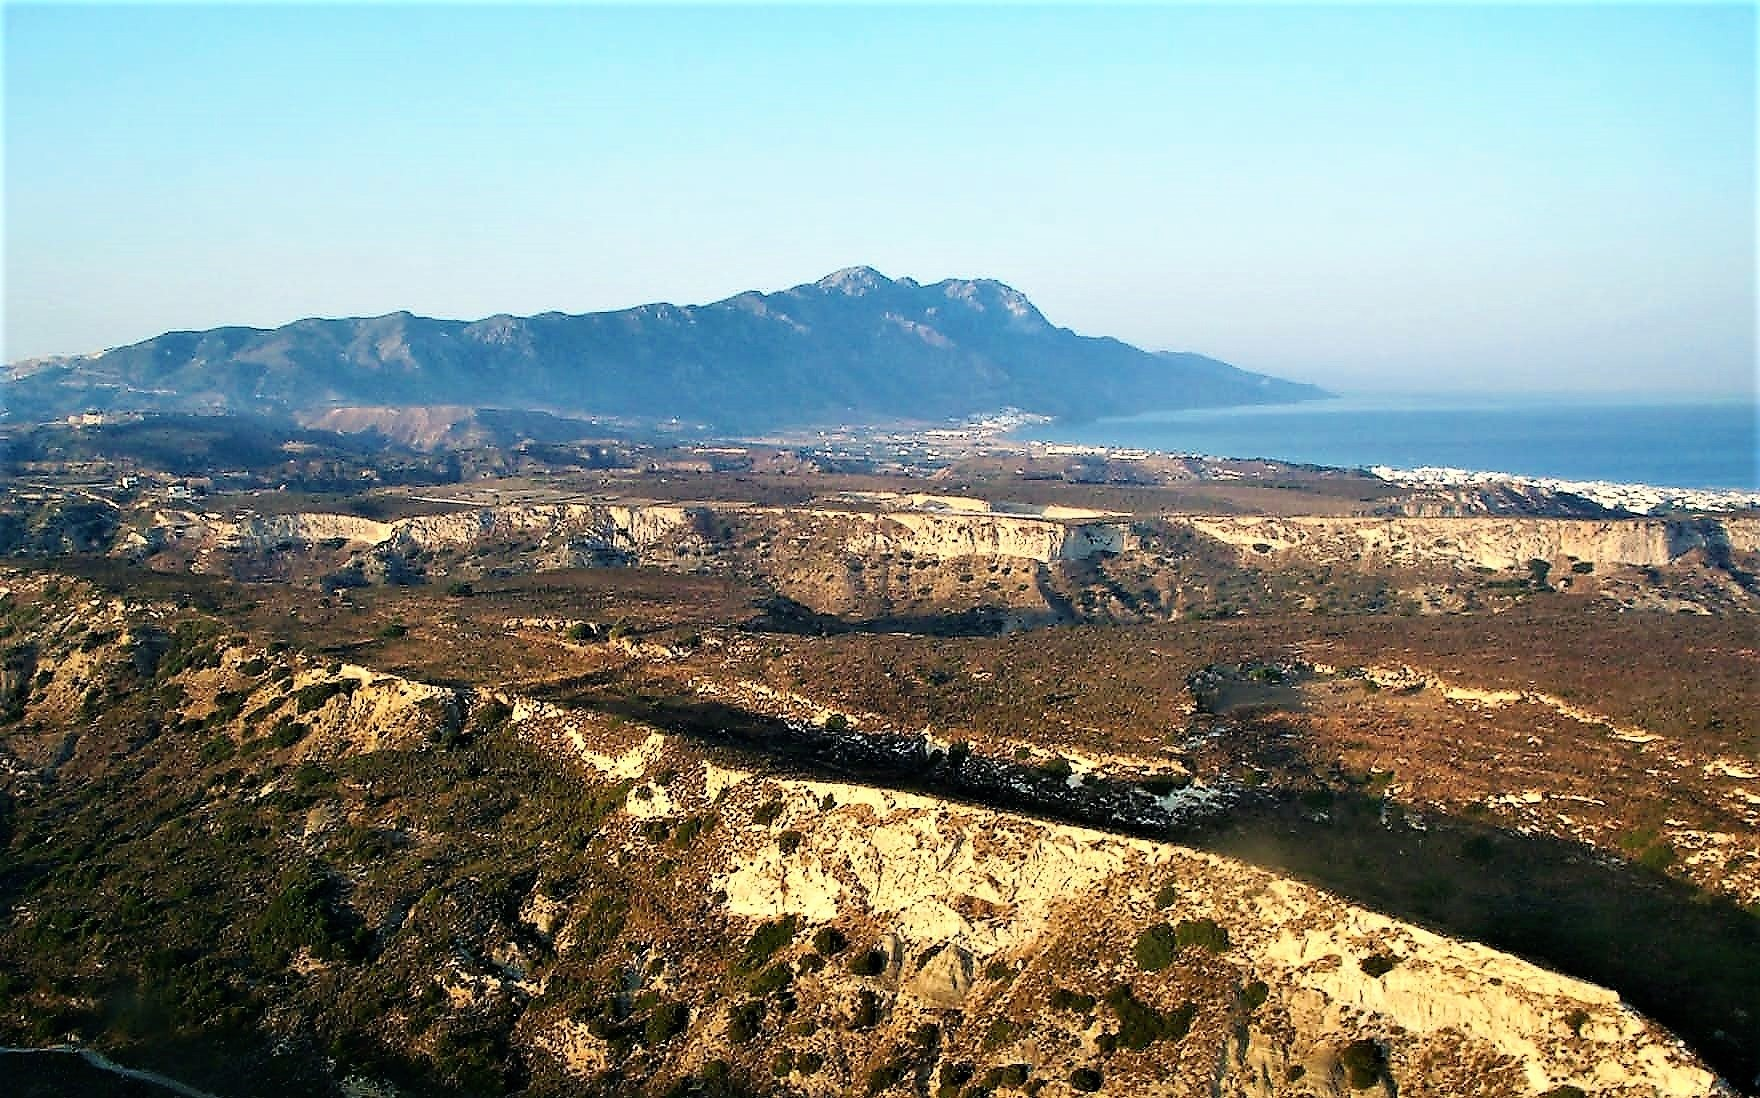 Antimacheia. Kos. Greece by Michael Lewis